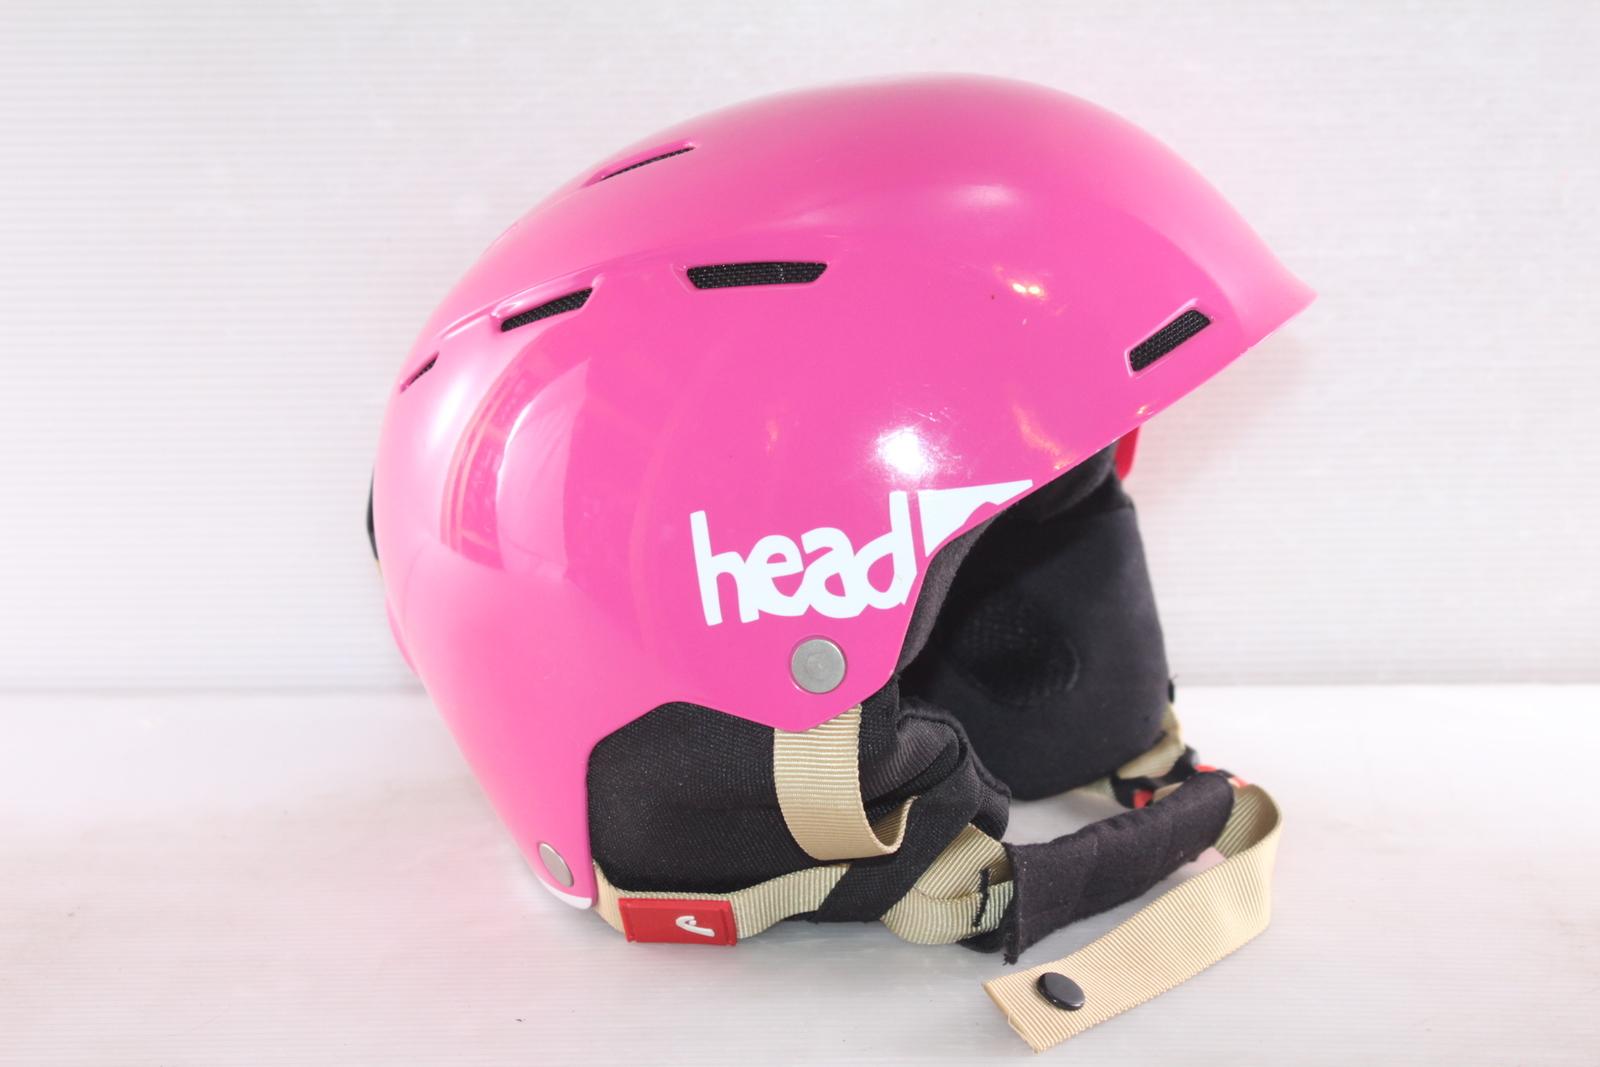 Dívčí lyžařská helma Head Air Youth Pink - posuvná vel. 56 - 59